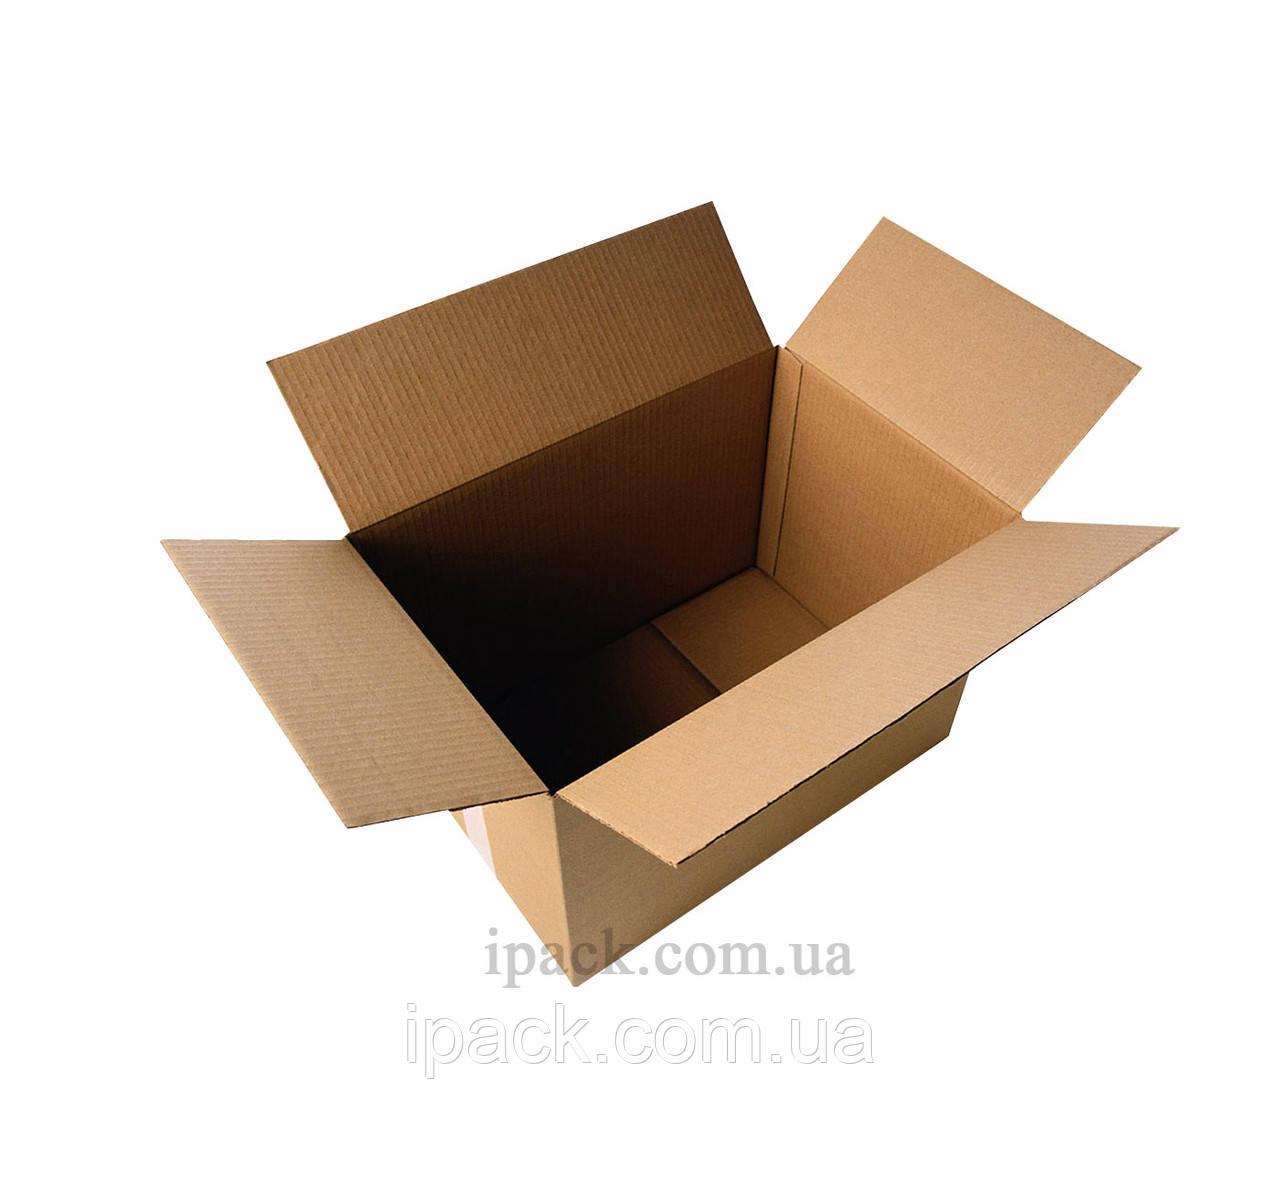 Гофроящик 433*254*166 мм, бурый, четырехклапанный картонный короб